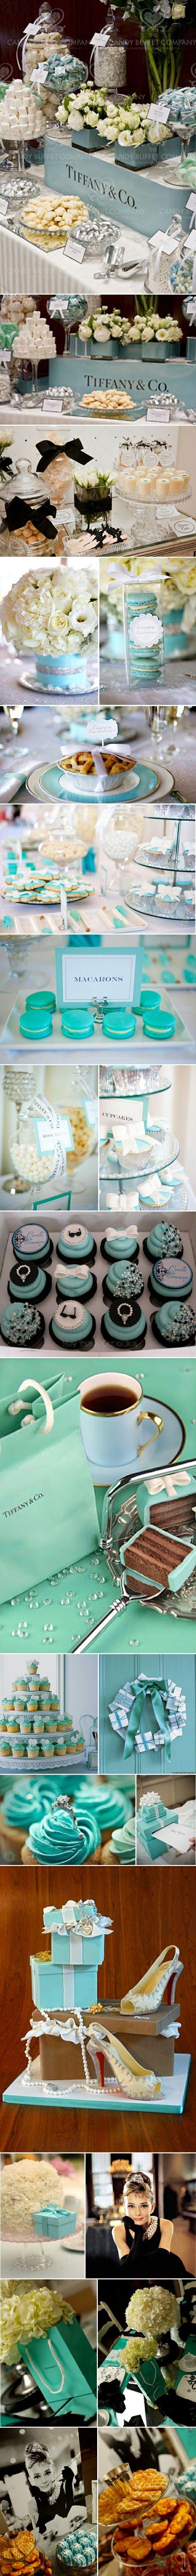 Breakfast at Tiffany themed Wedding/Wedding Shower